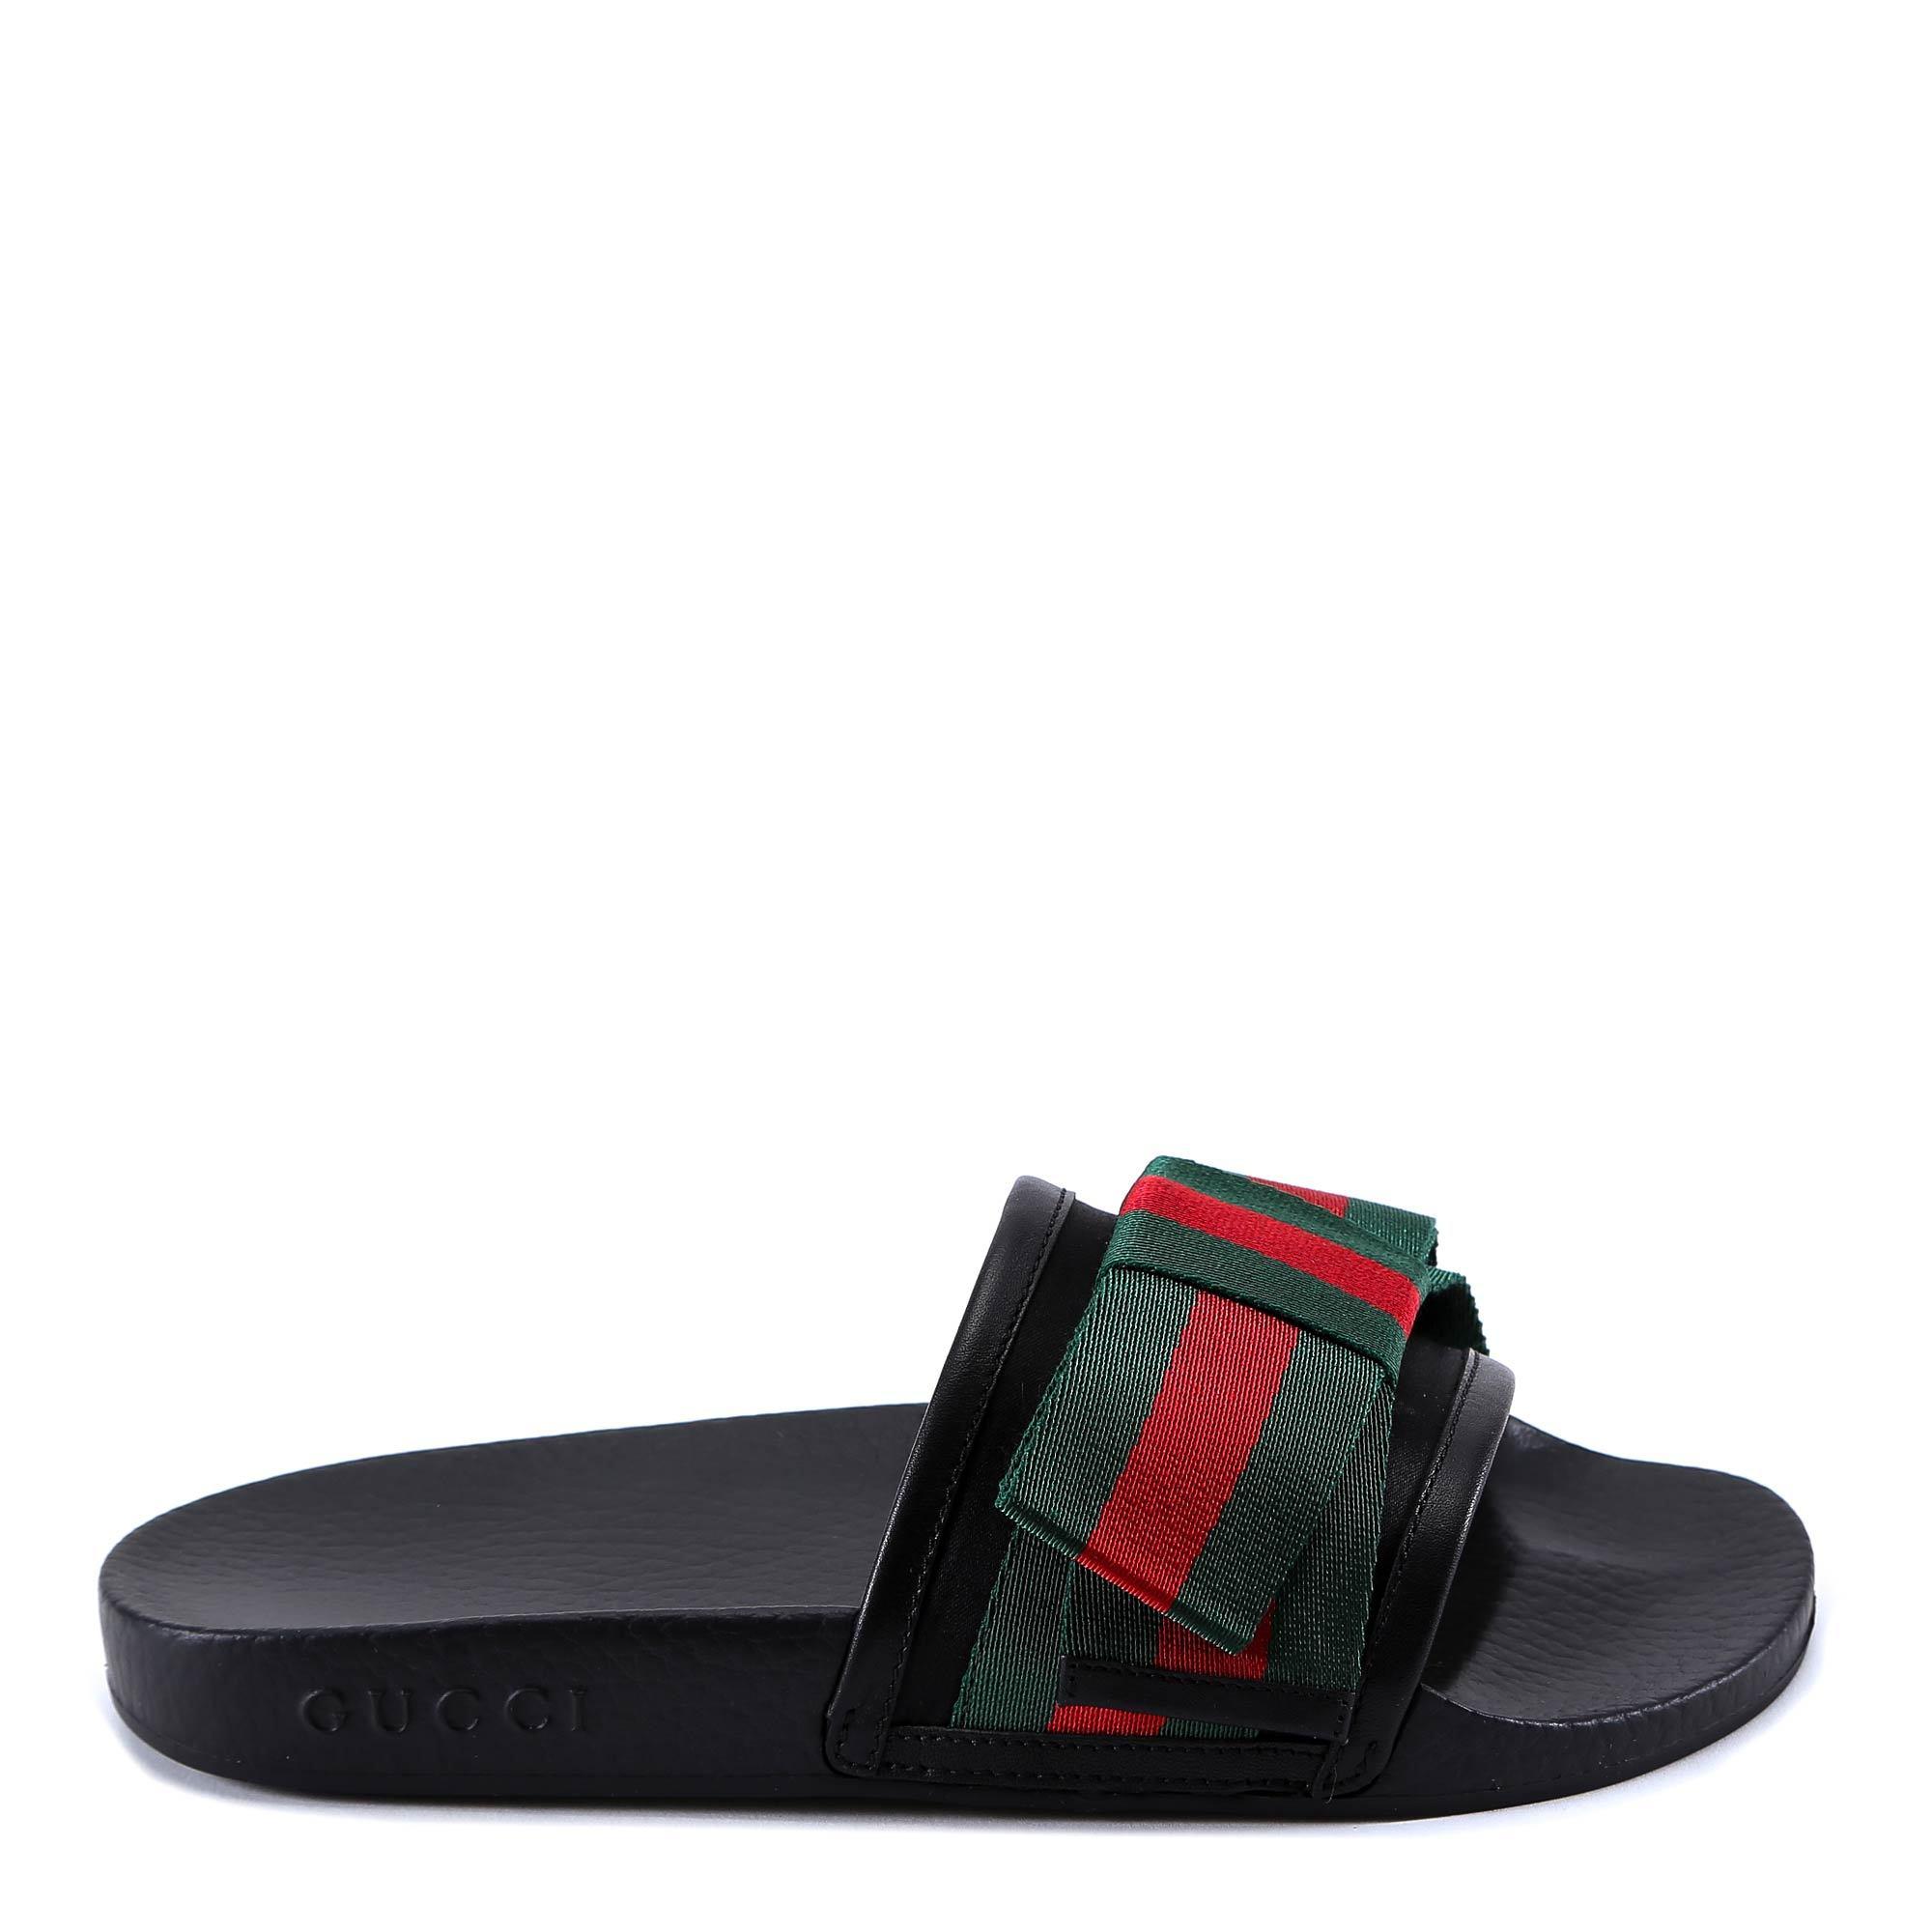 ab2270fd8c5f46 Gucci Women s Pursuit Satin Bow Pool Slide Sandals In Black